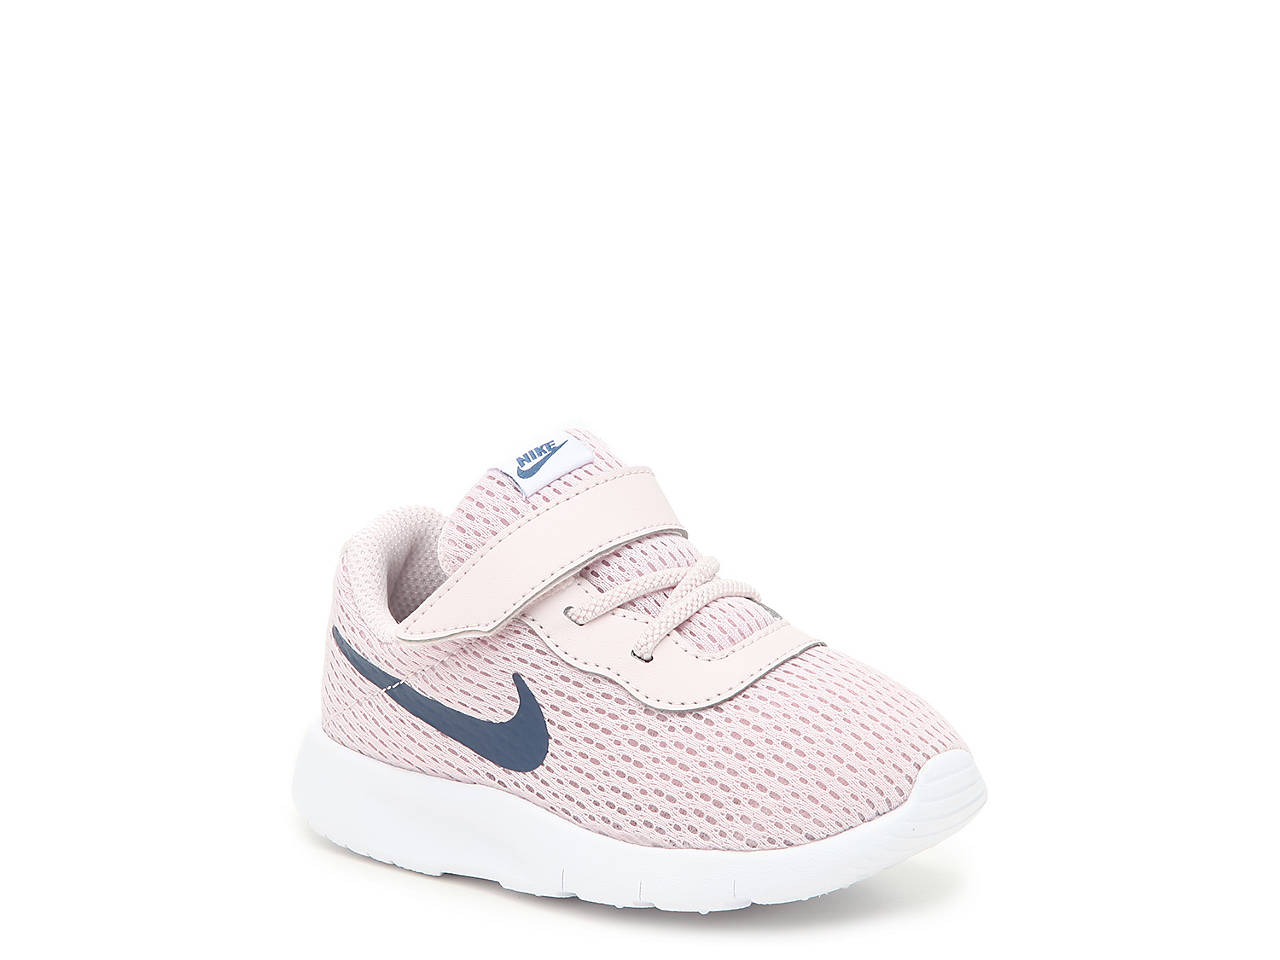 e10f0bfbee Nike Tanjun Infant & Toddler Sneaker Kids Shoes | DSW